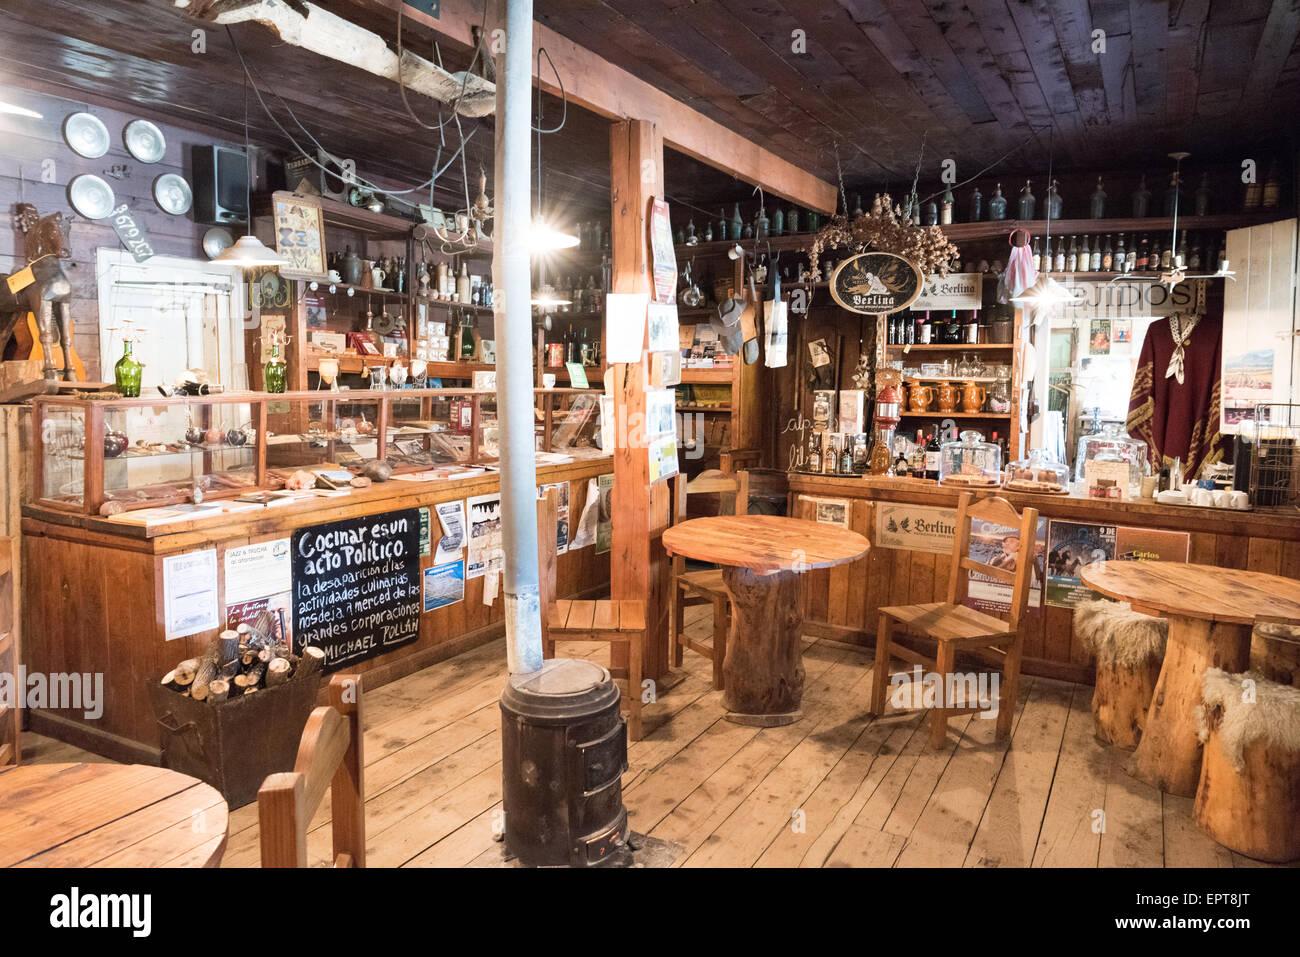 El Viejo Almacen del Foyel - Restaurant and Museum of Mapuche life - on La Ruta 40 near El Bolson, Neuquen Province, - Stock Image